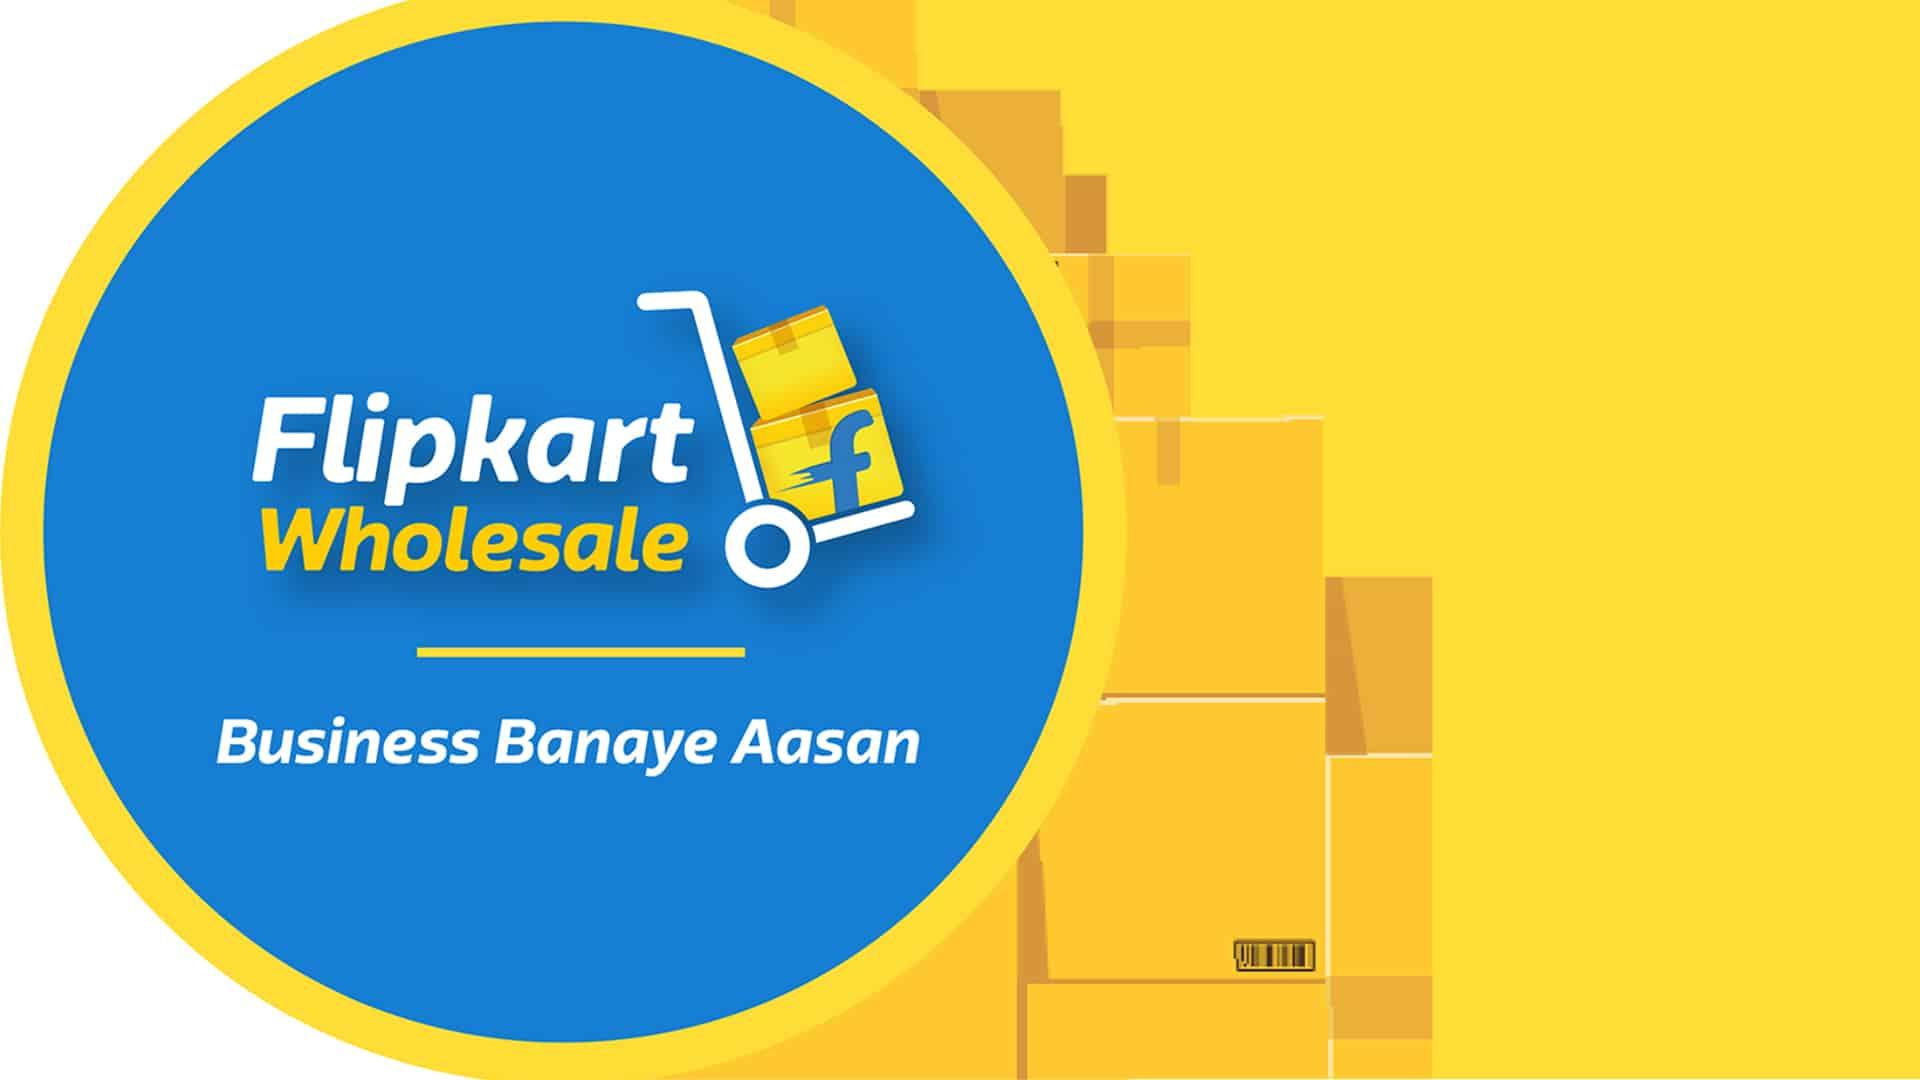 Flipkart Wholesale Logo